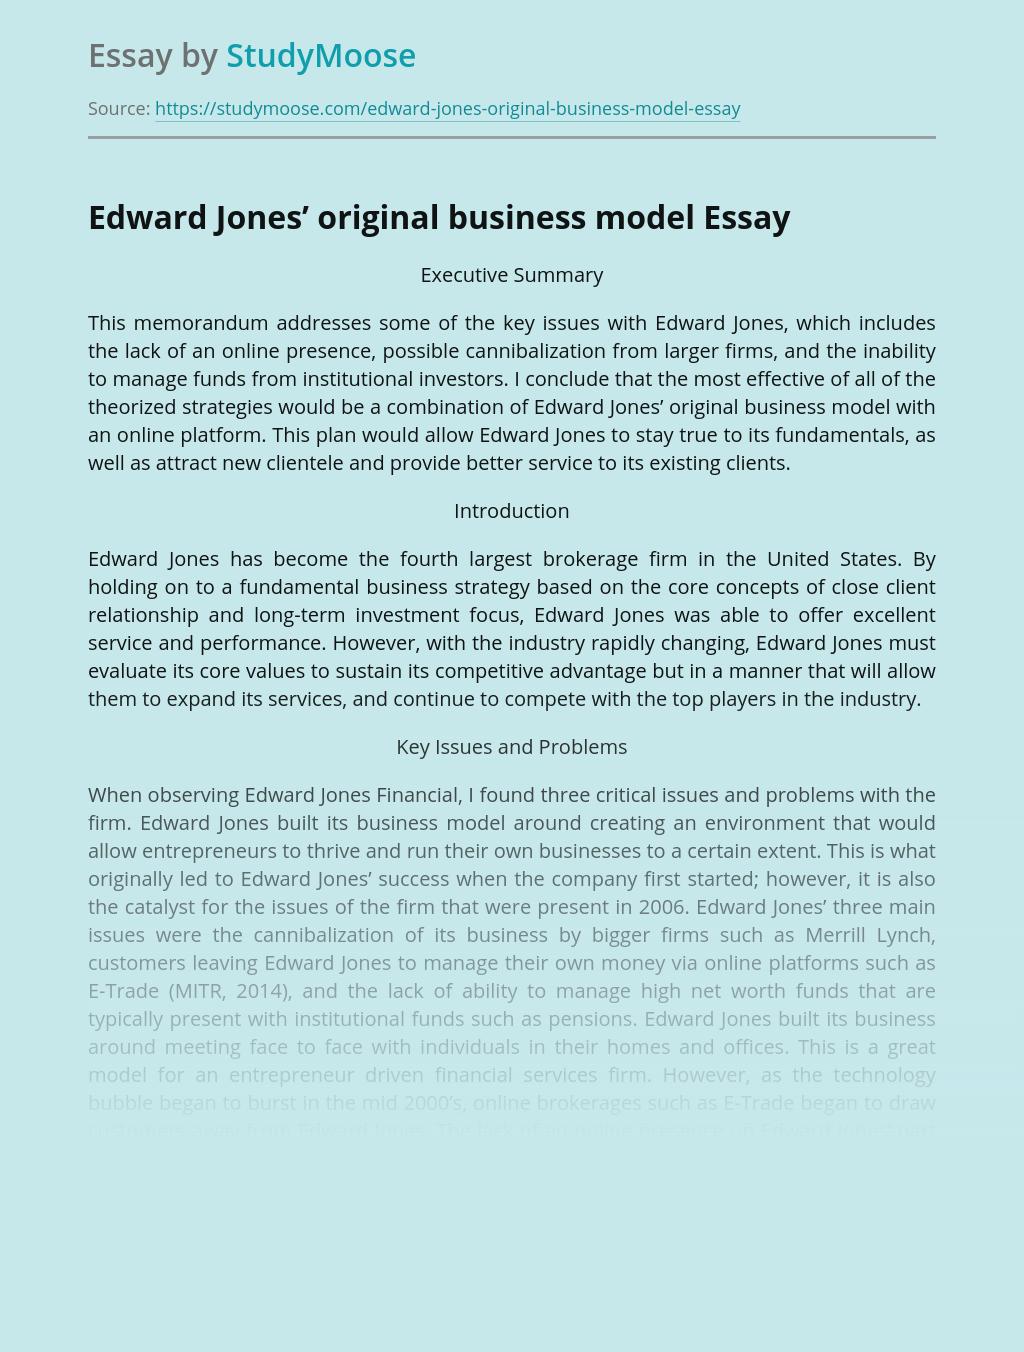 Edward Jones' original business model